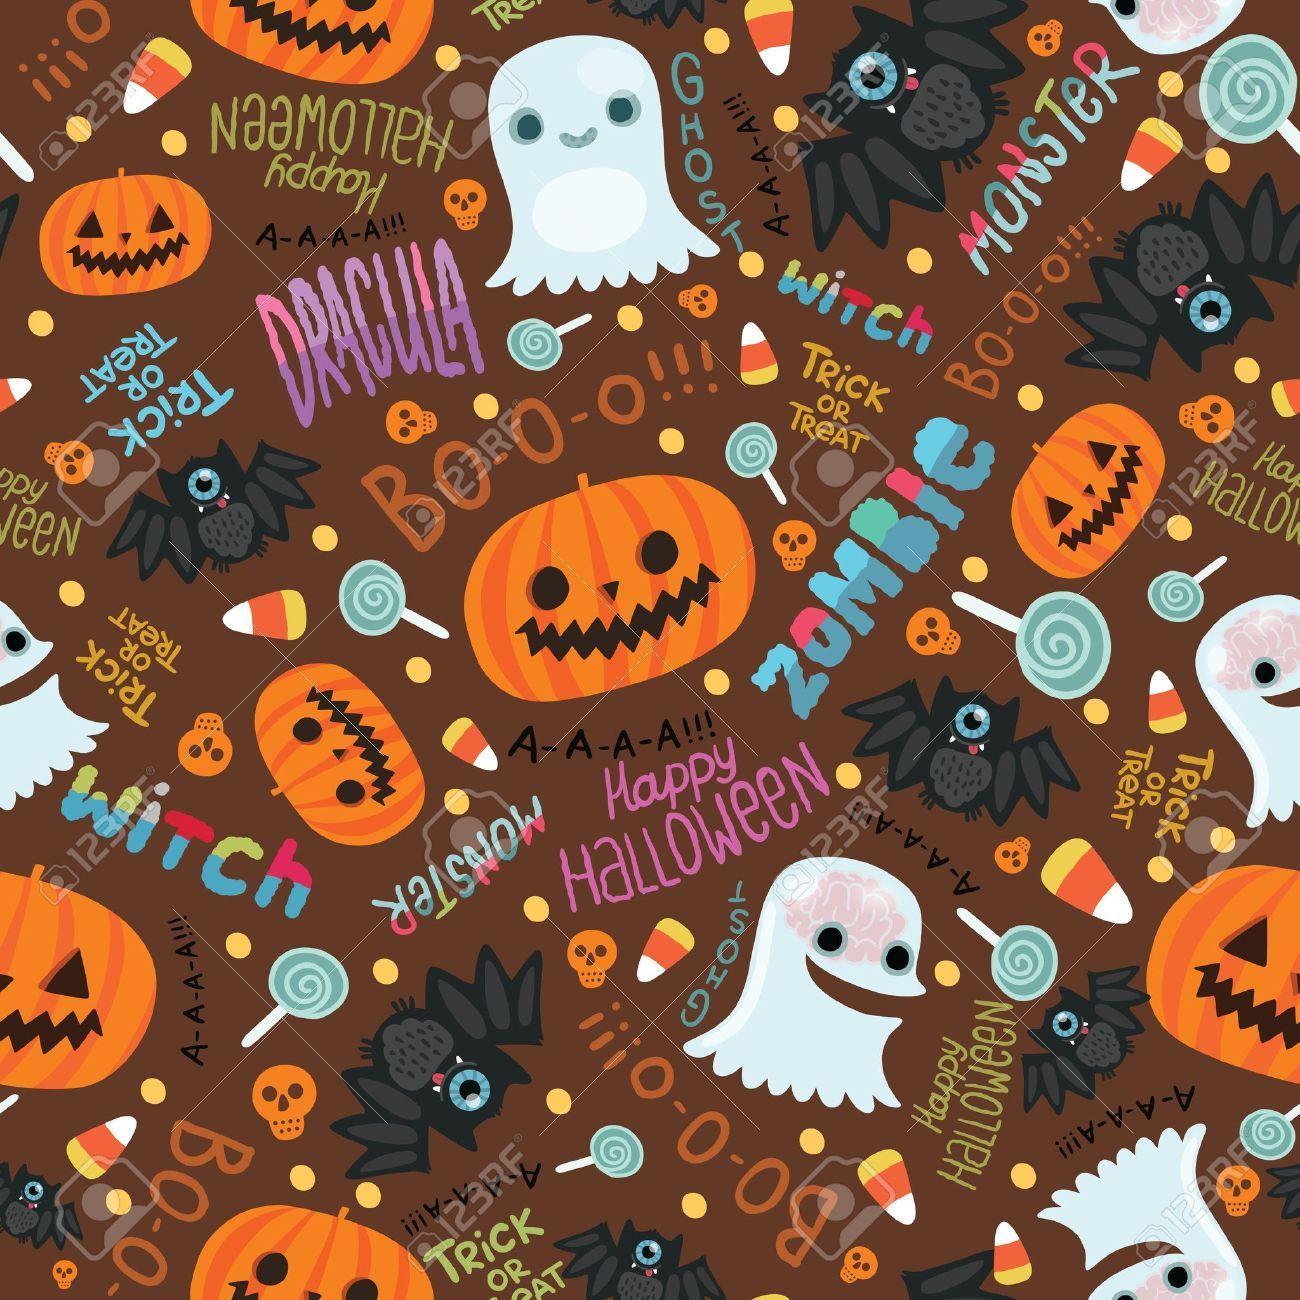 Cute Halloween Pattern Wallpapers Top Free Cute Halloween Pattern Backgrounds Wallpaperaccess